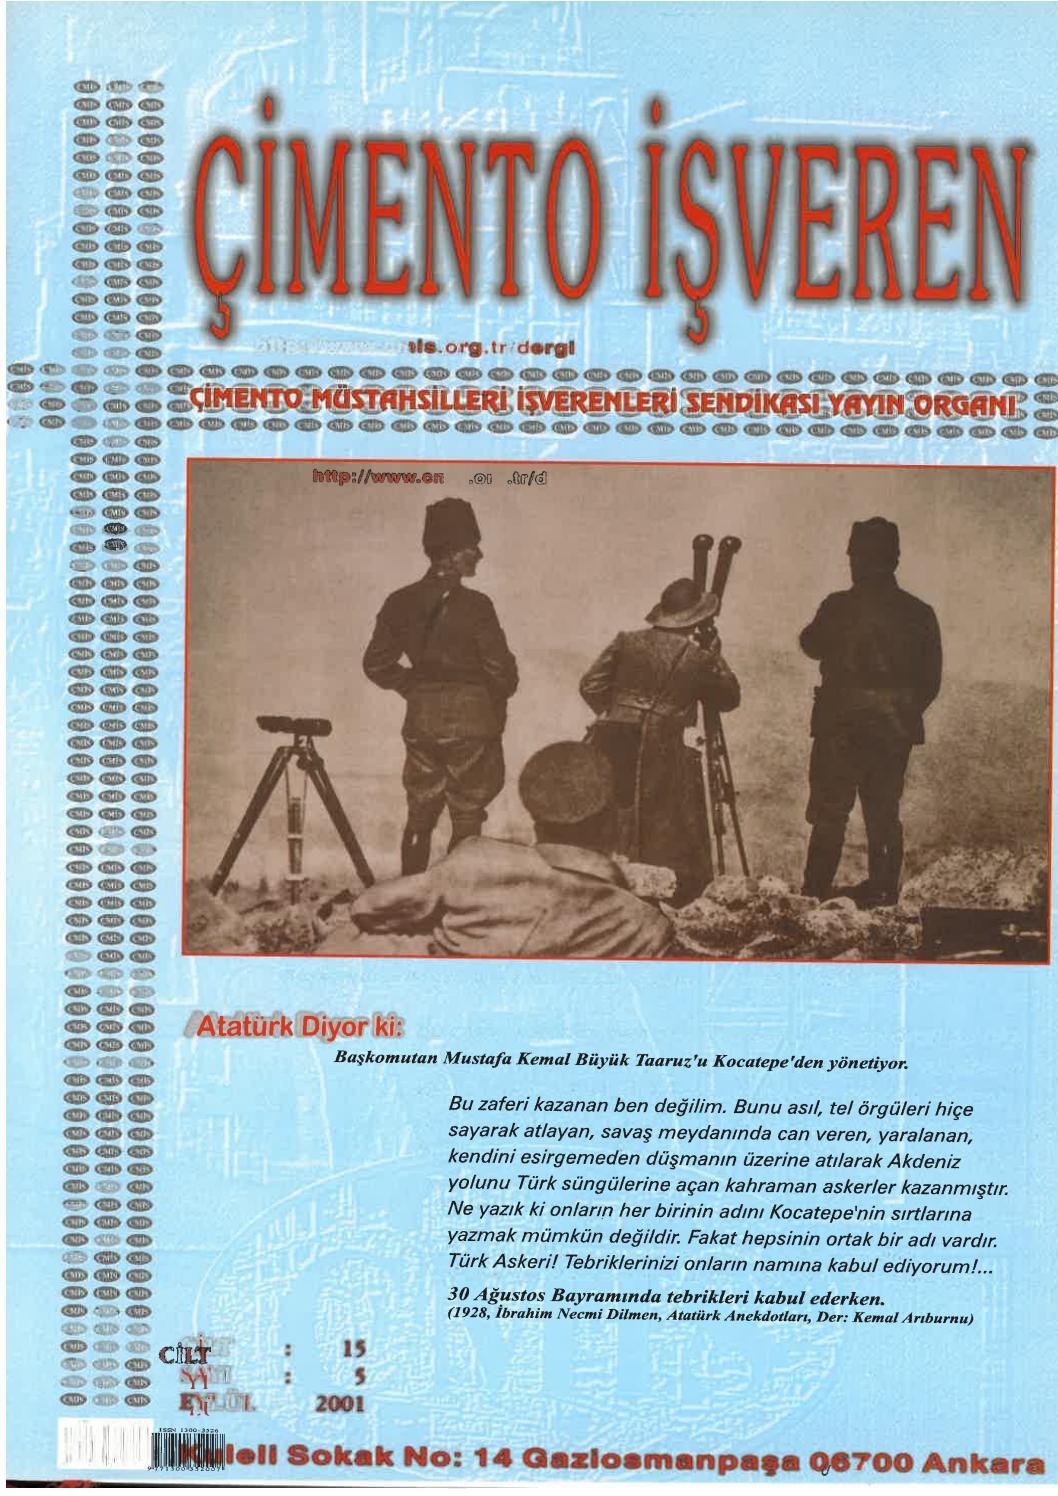 Cimento Isveren Dergisi Eylul 2001 By Ceis Takvim Issuu